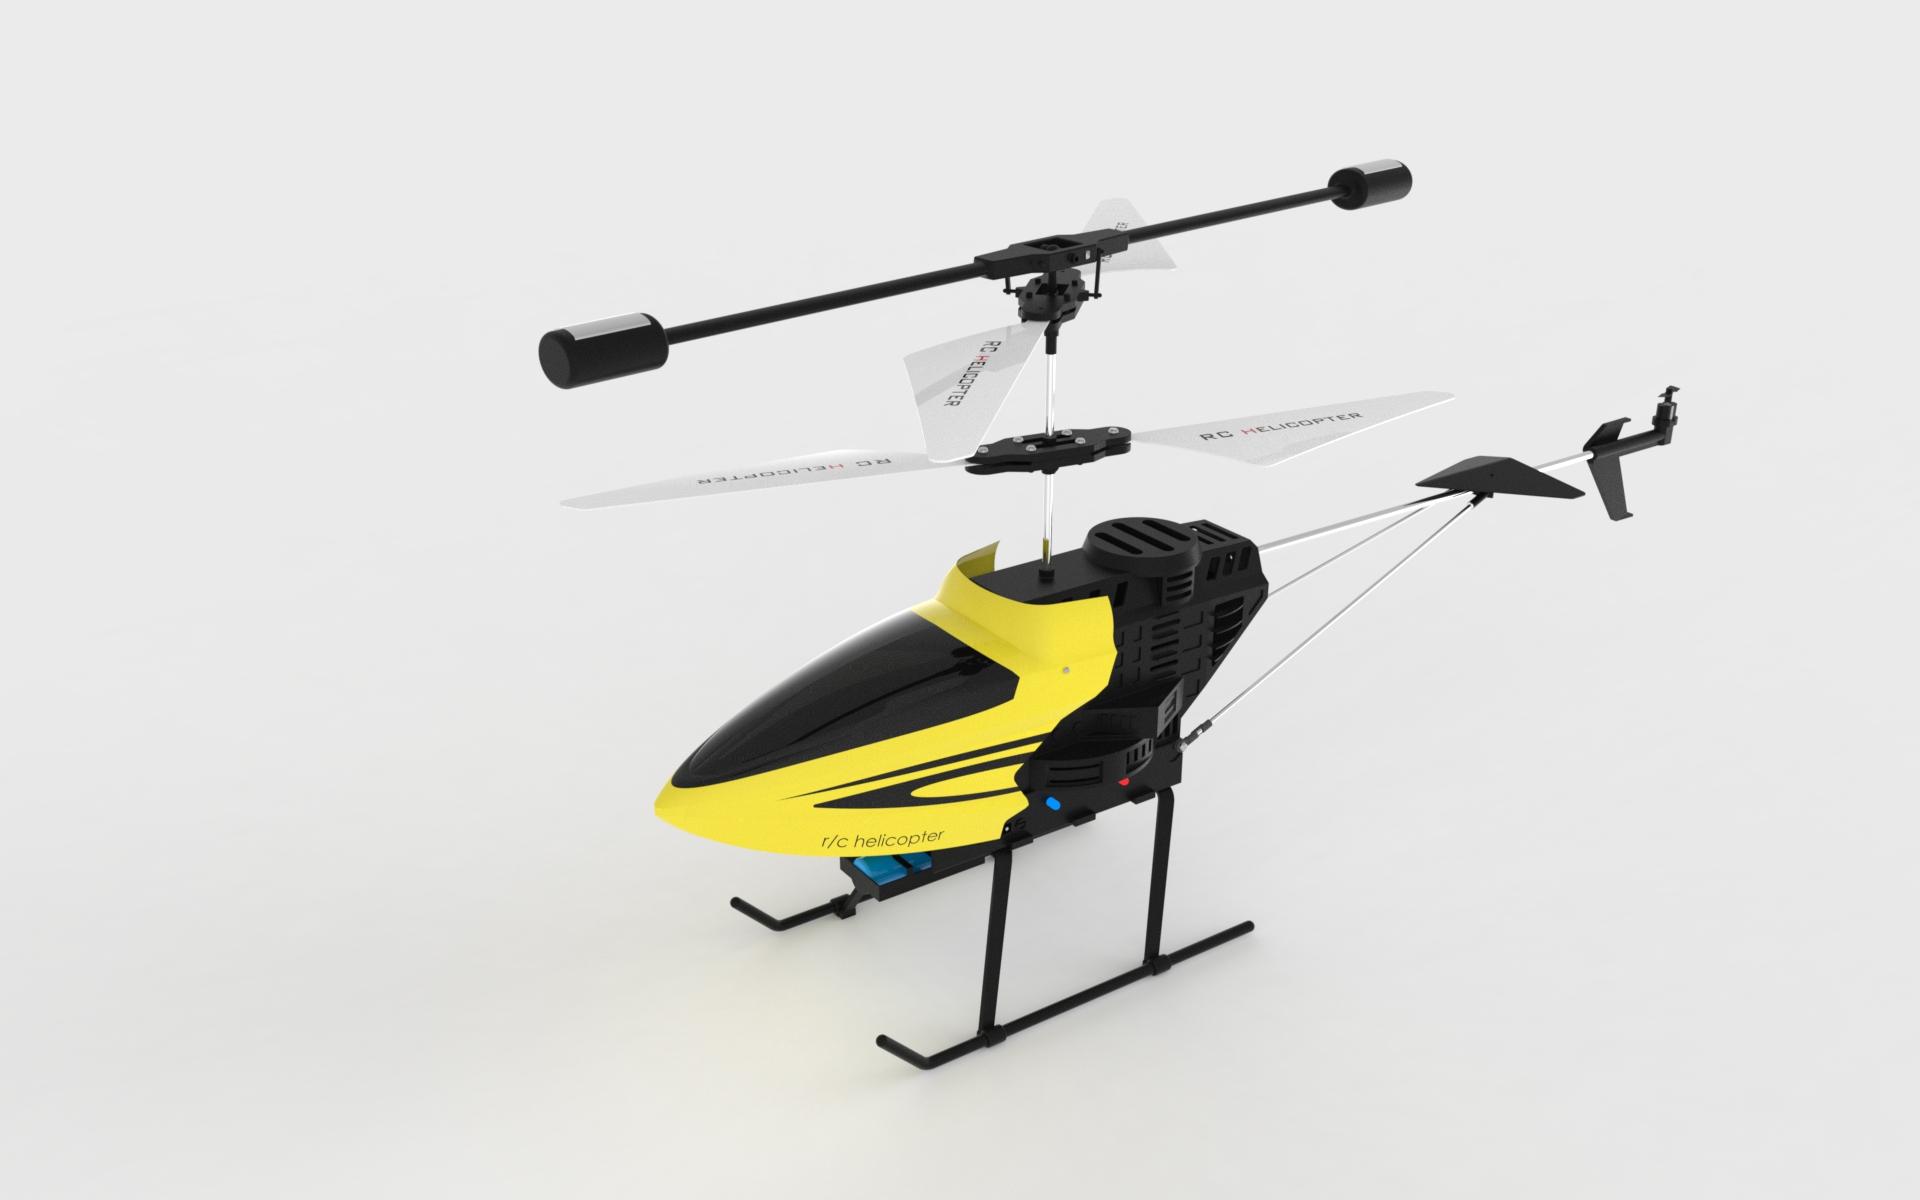 rc helicopter 37遥控直升机玩具模型3D图纸 Solidworks设计